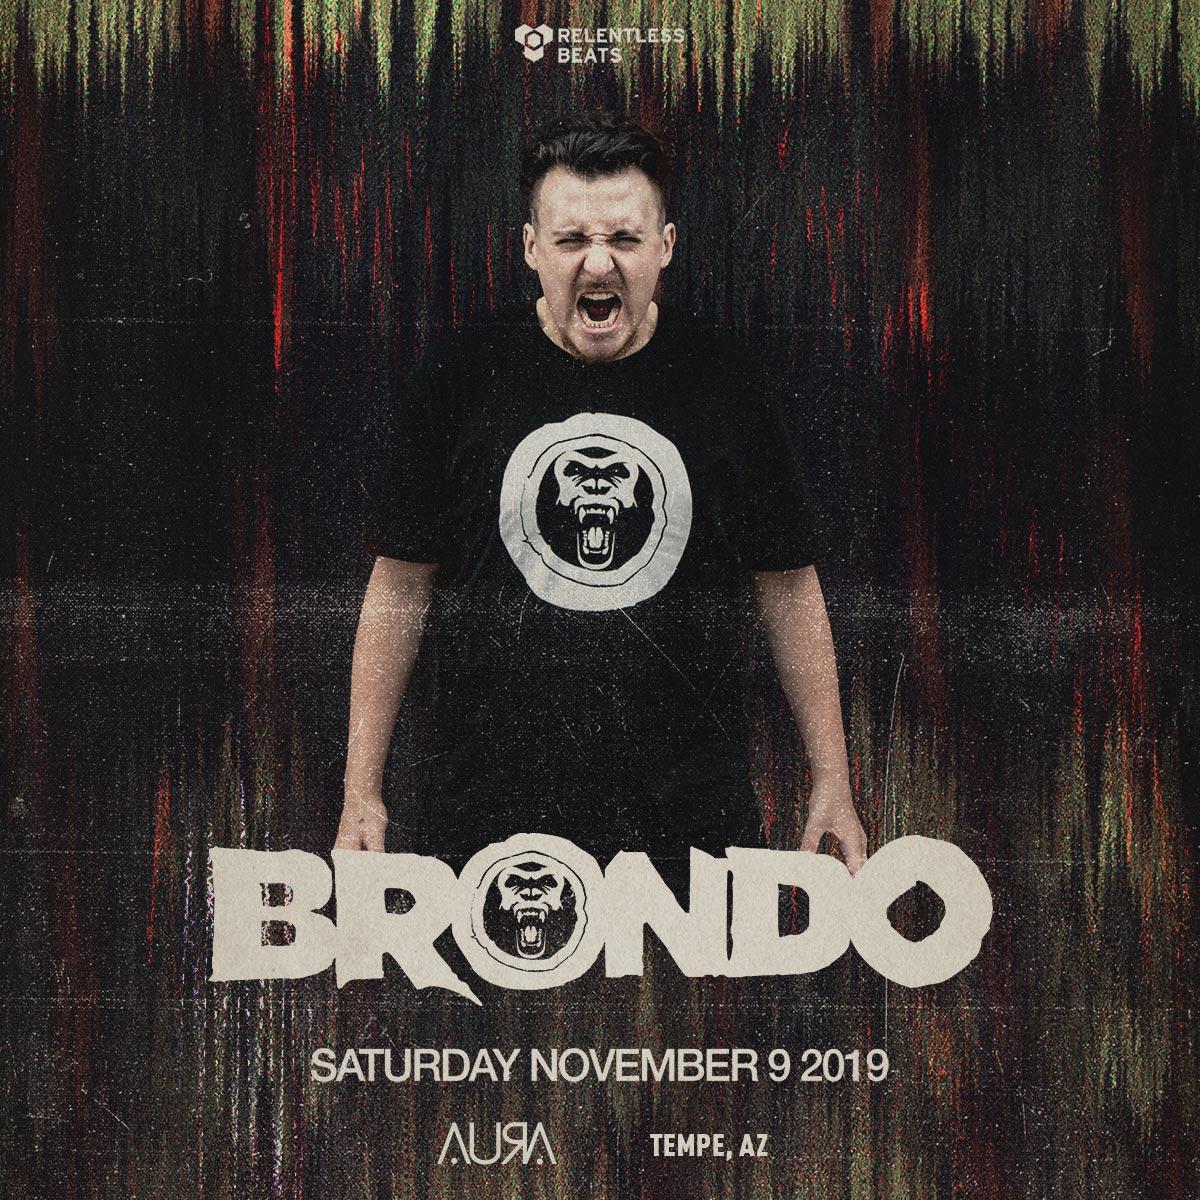 Flyer for Brondo